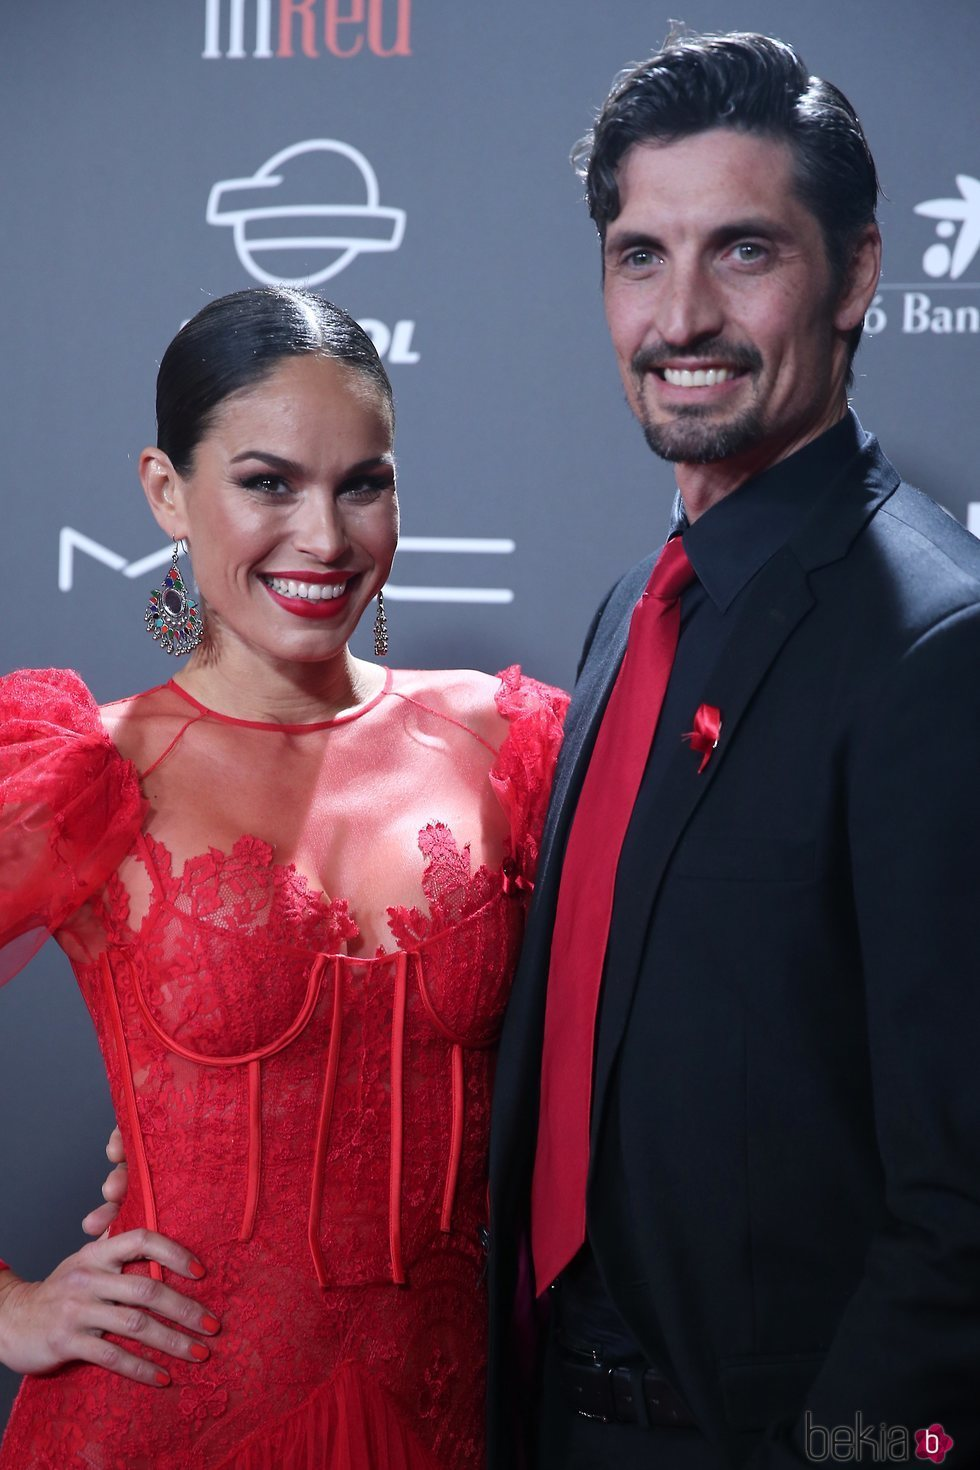 Mireia Canalda y Felipe López en la gala 'People in red' 2018